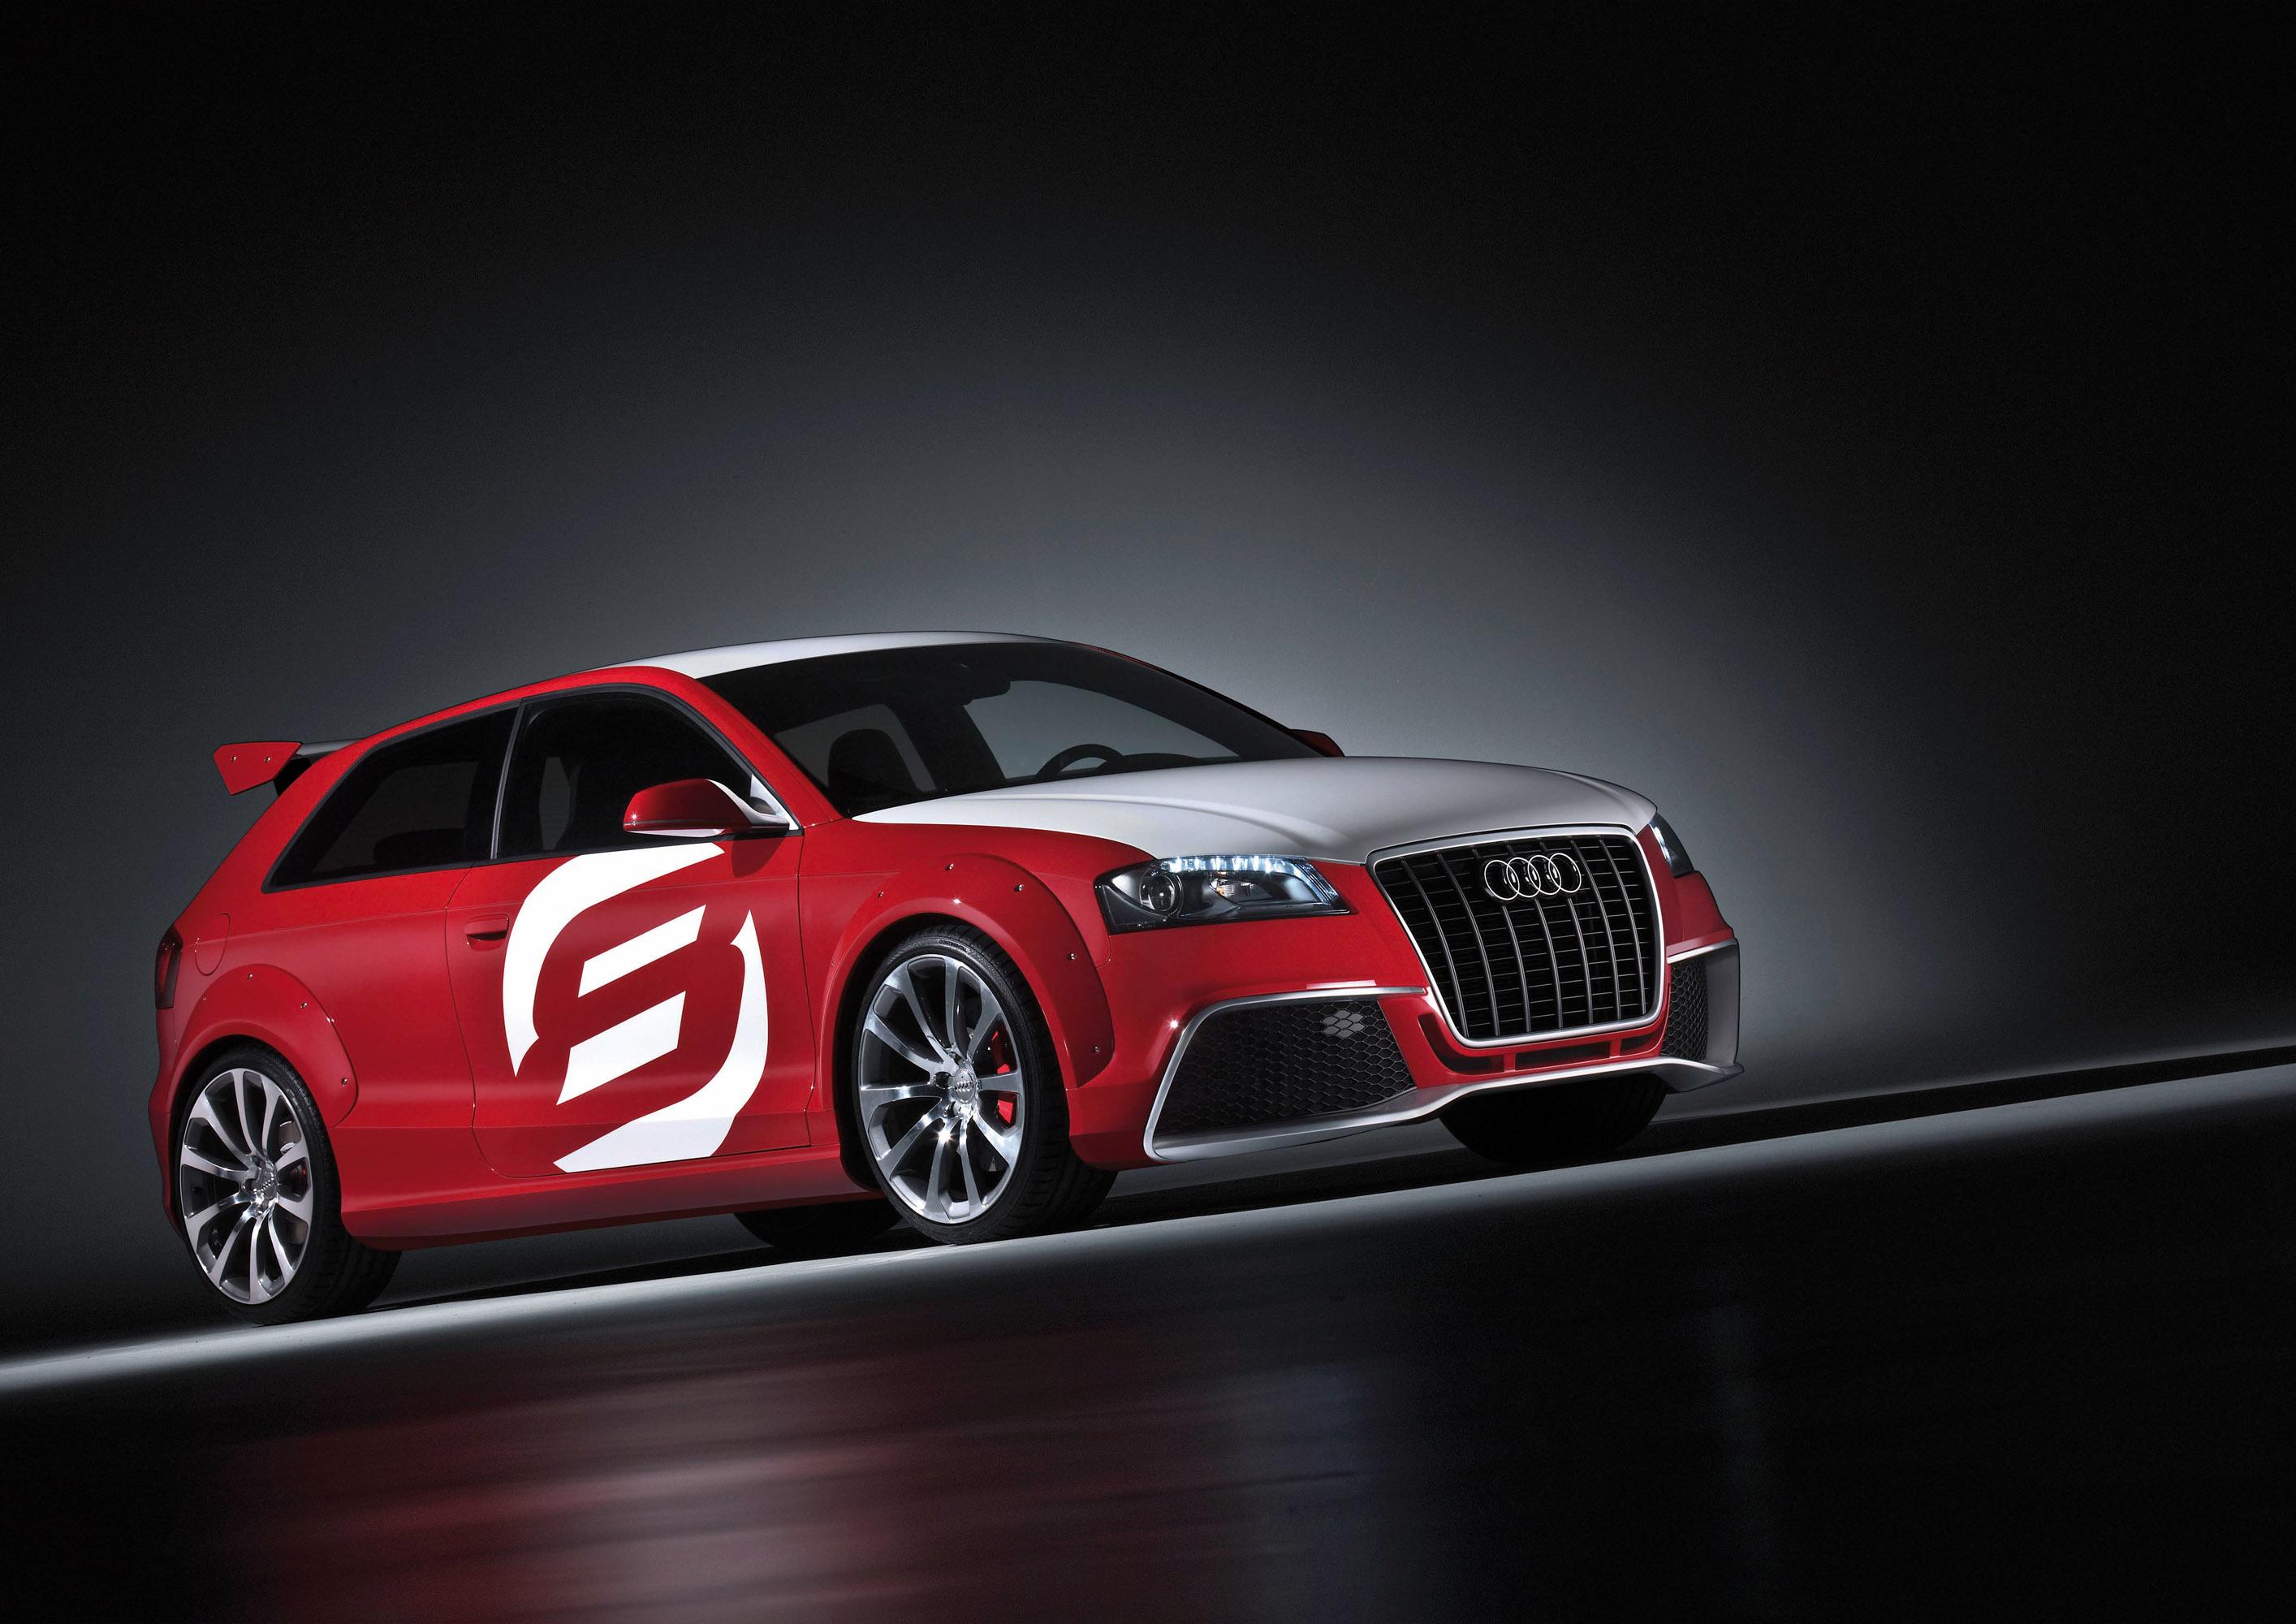 Audi A TDI Clubsport Quattro - Audi a3 04 car mats